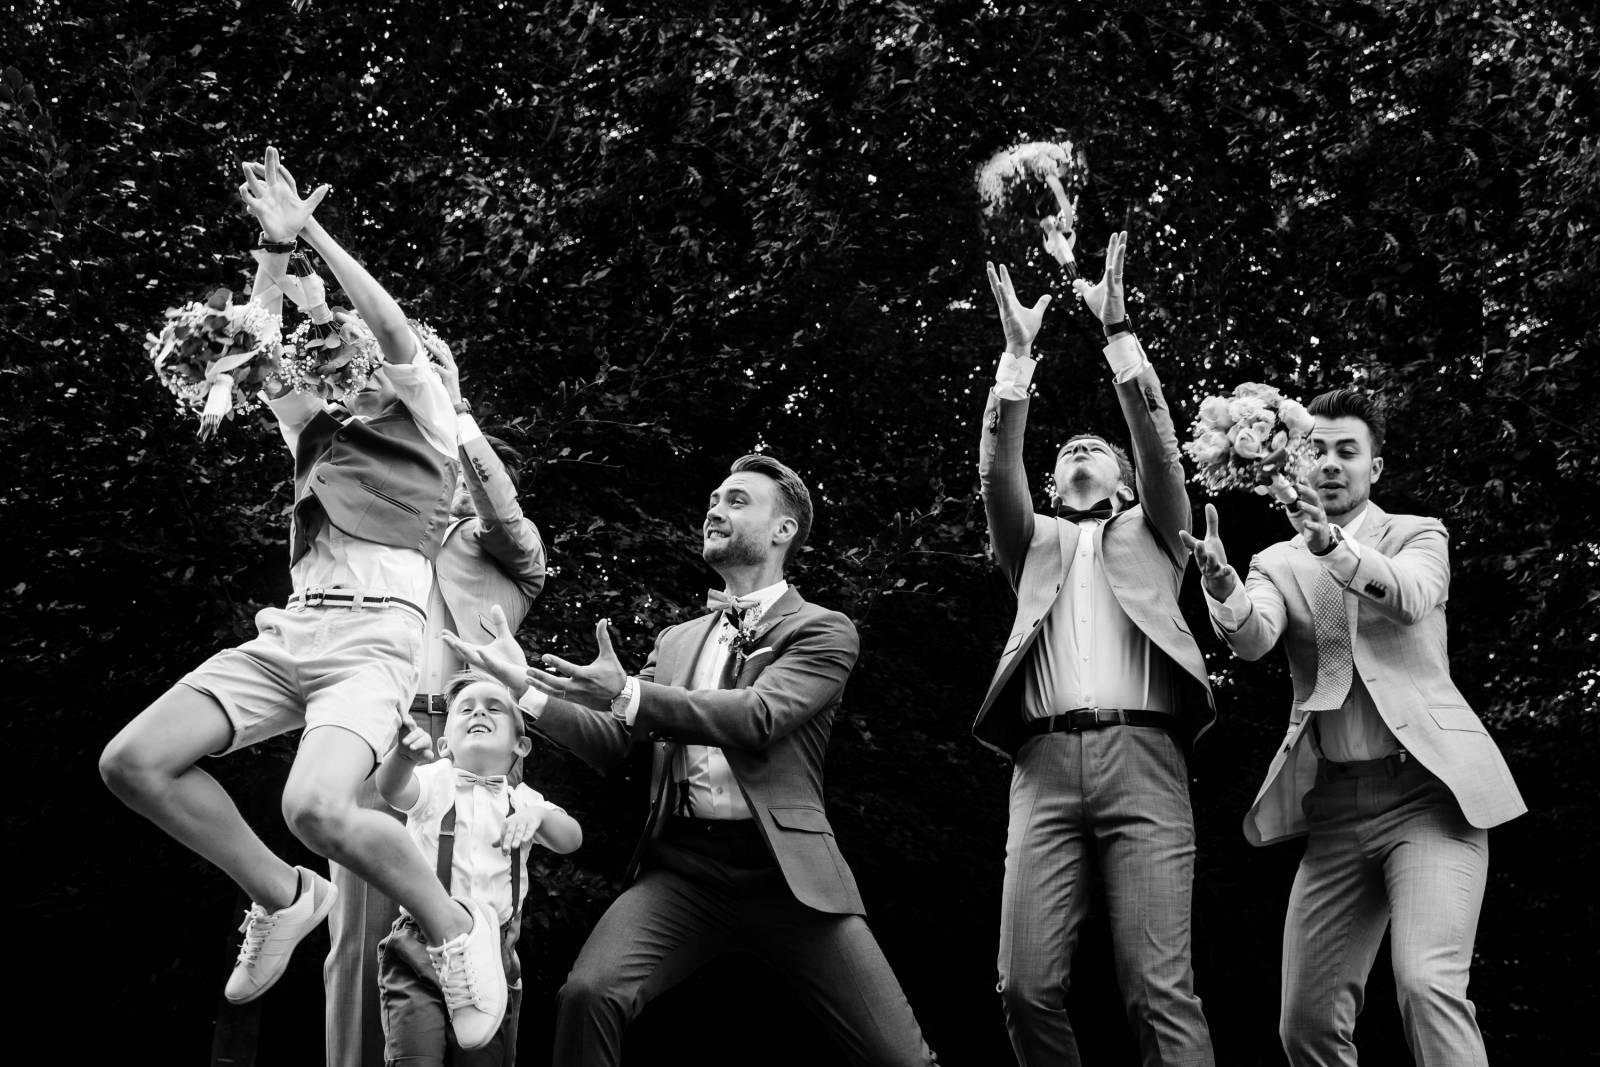 Philippe Swiggers - huwelijksfotograaf - House of Weddings - 1